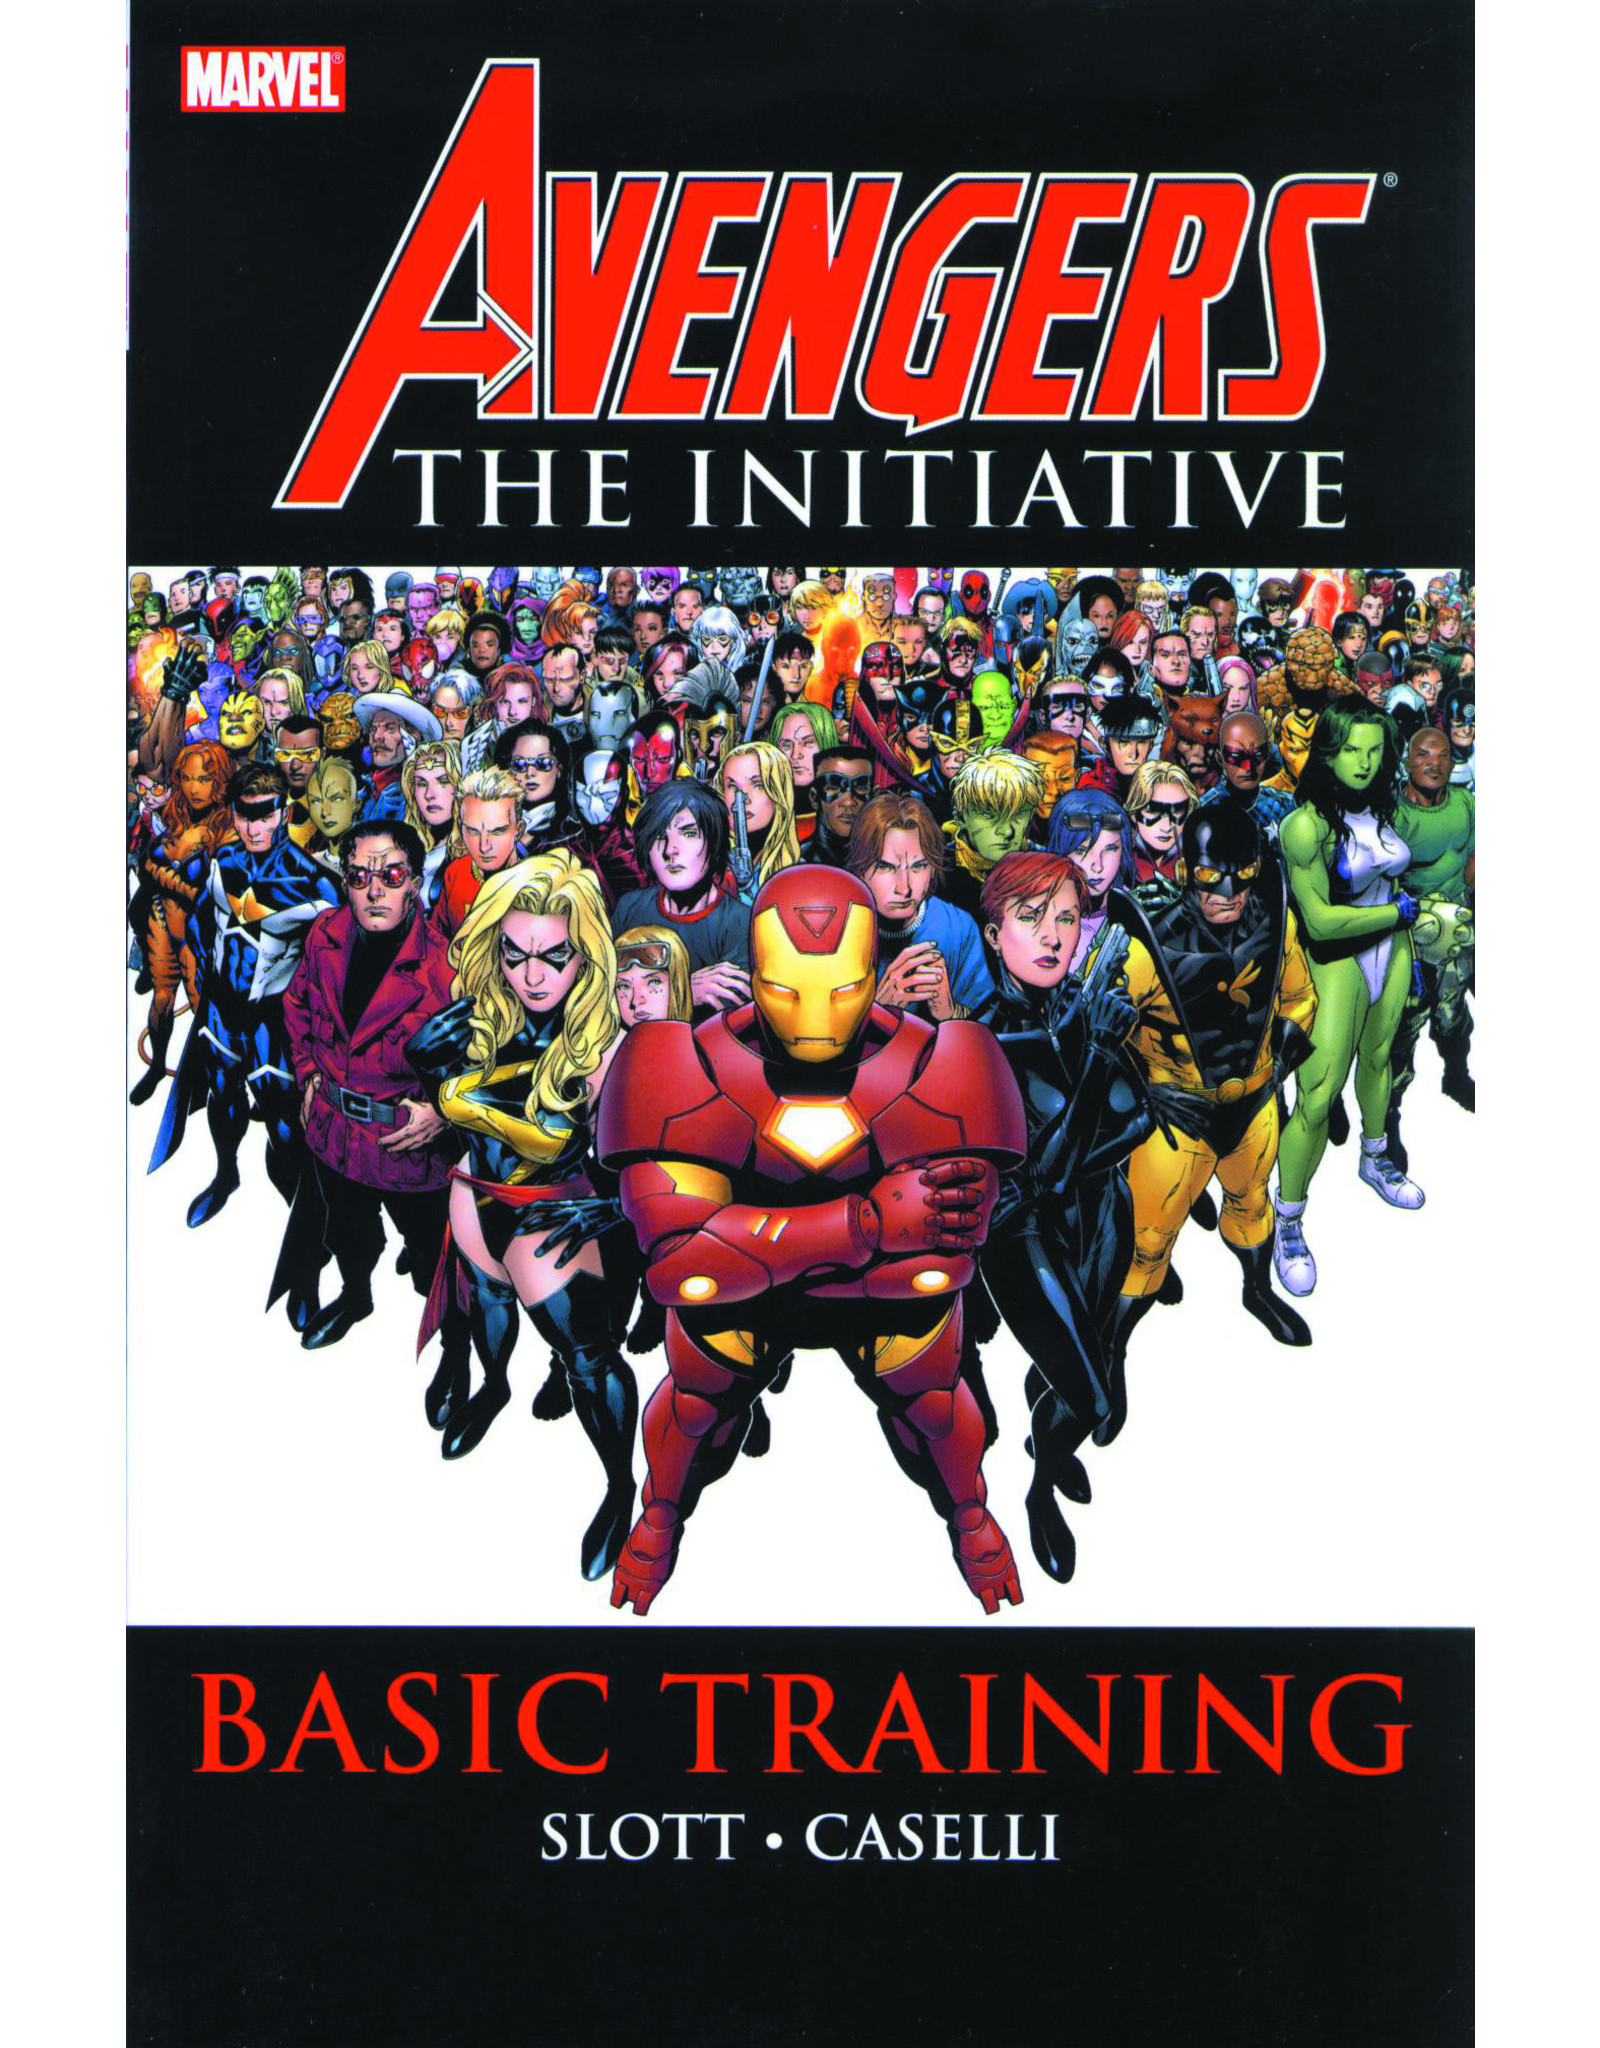 MARVEL COMICS AVENGERS INITIATIVE TP VOL 01 BASIC TRAINING